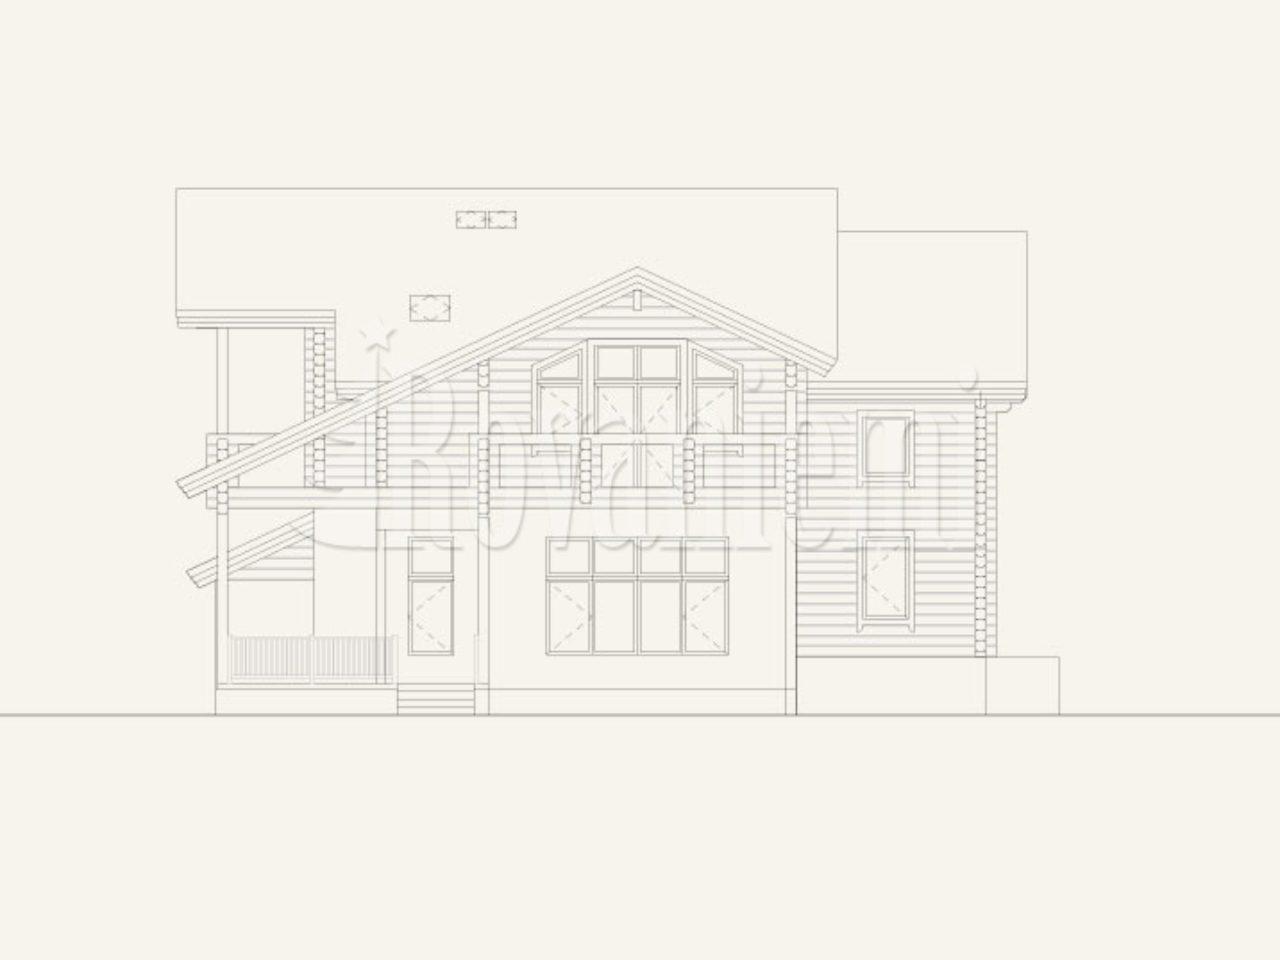 Fasad-3-Solnechnyj